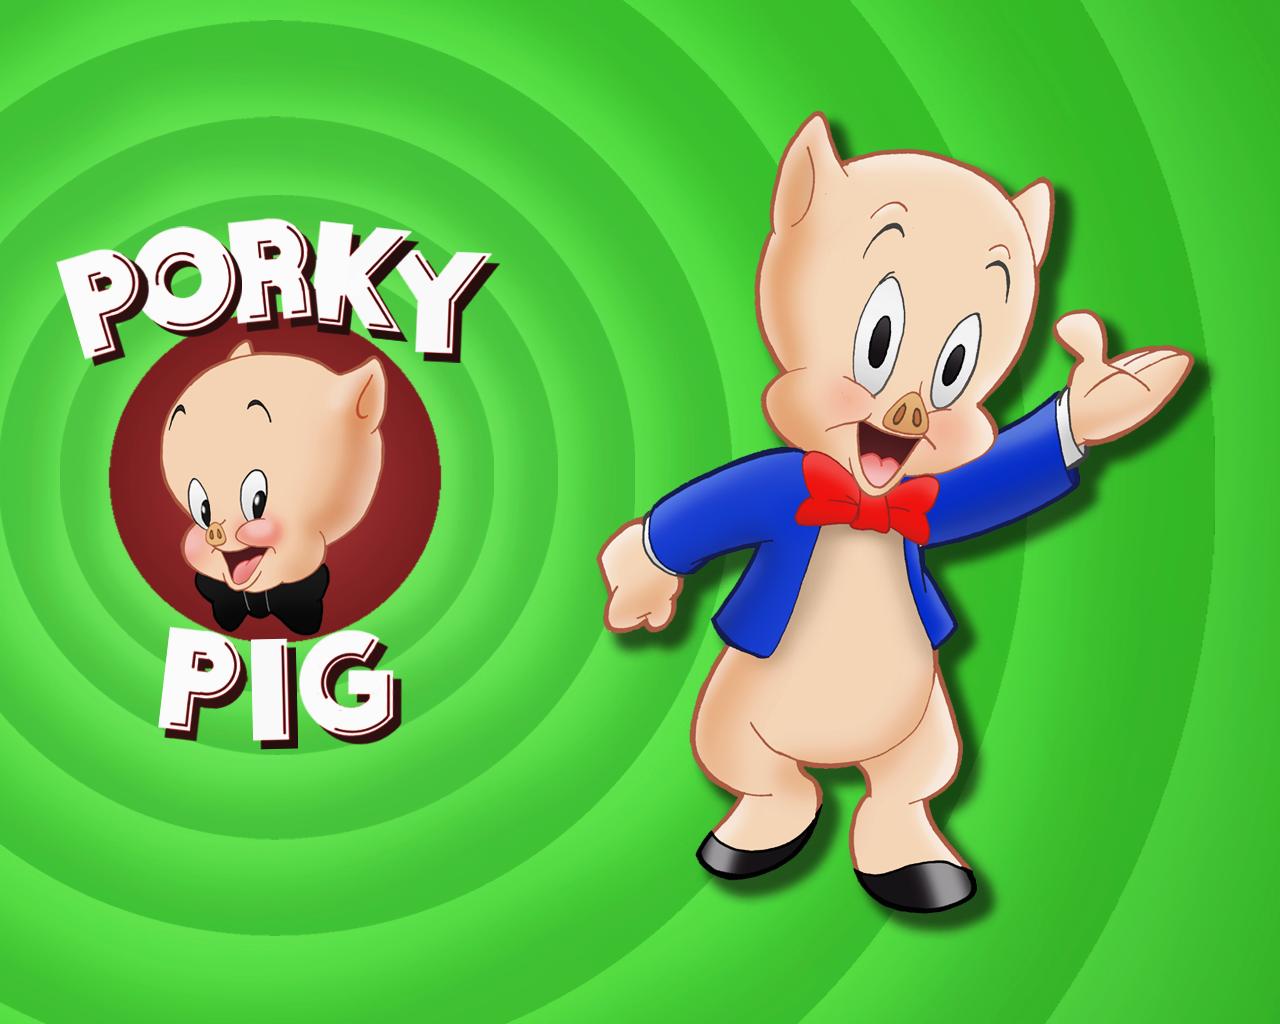 http://3.bp.blogspot.com/-ySm-KrIbK-8/TpvbW283BMI/AAAAAAAAANE/hl3RQJWKAt8/s1600/Porky_Pig_Wallpaper_by_E_122_Psi-1.png